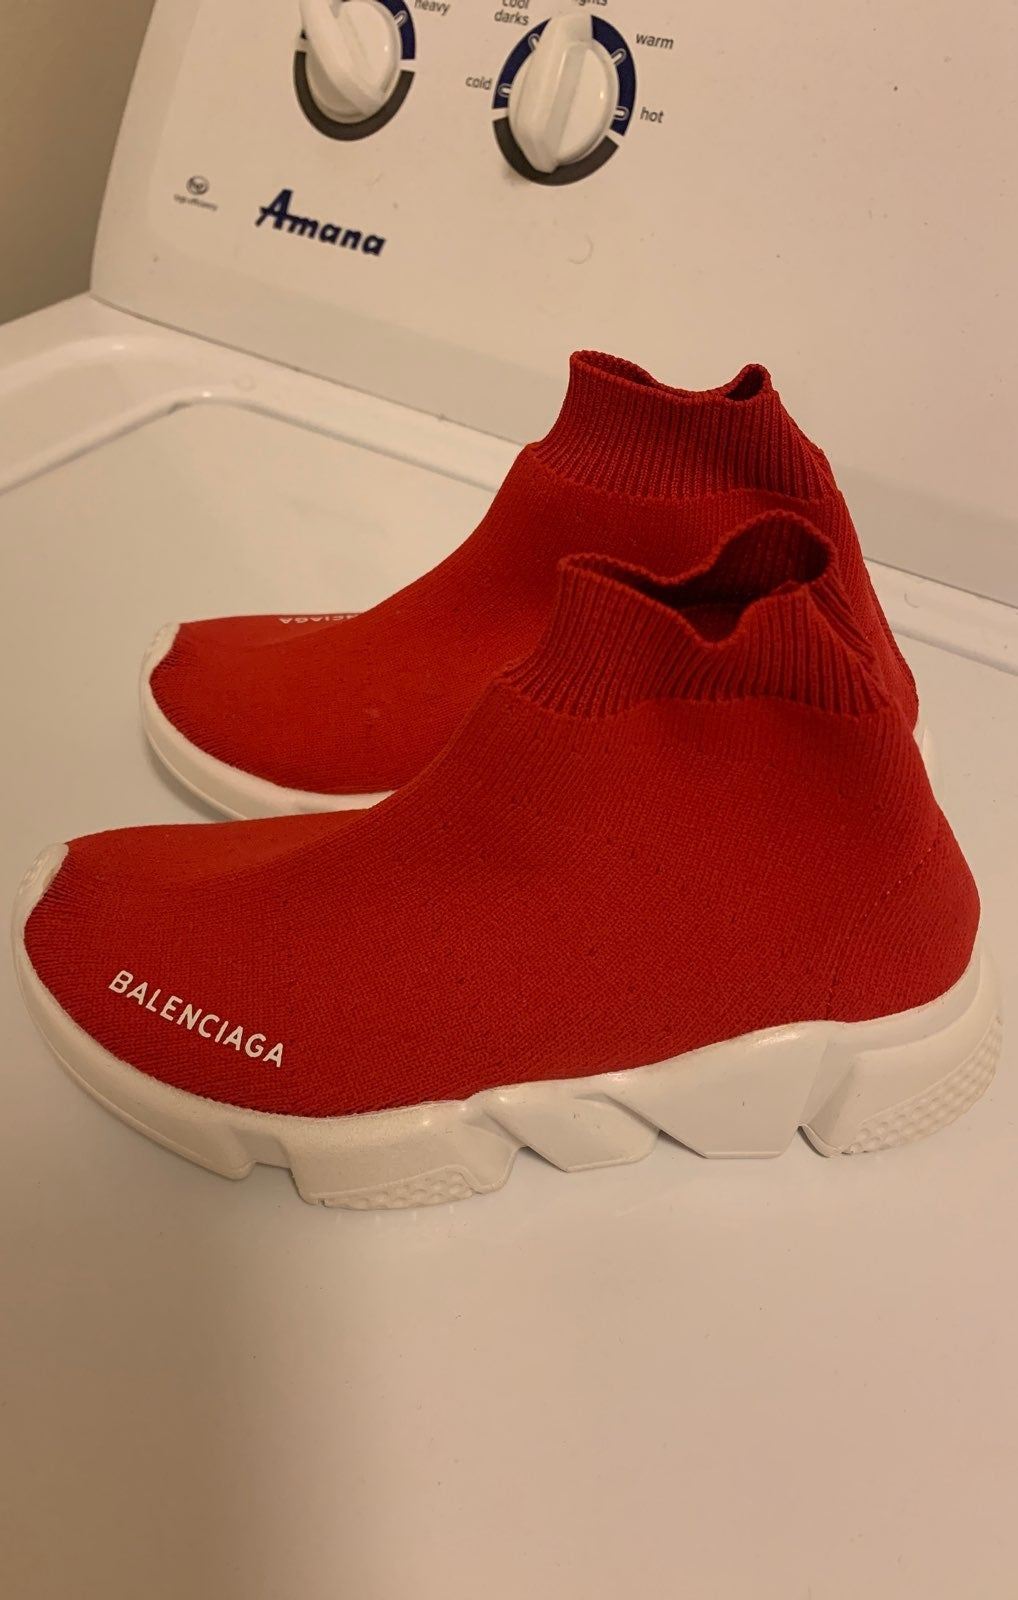 Balenciaga Shoes for Boys 2T-5T | Mercari